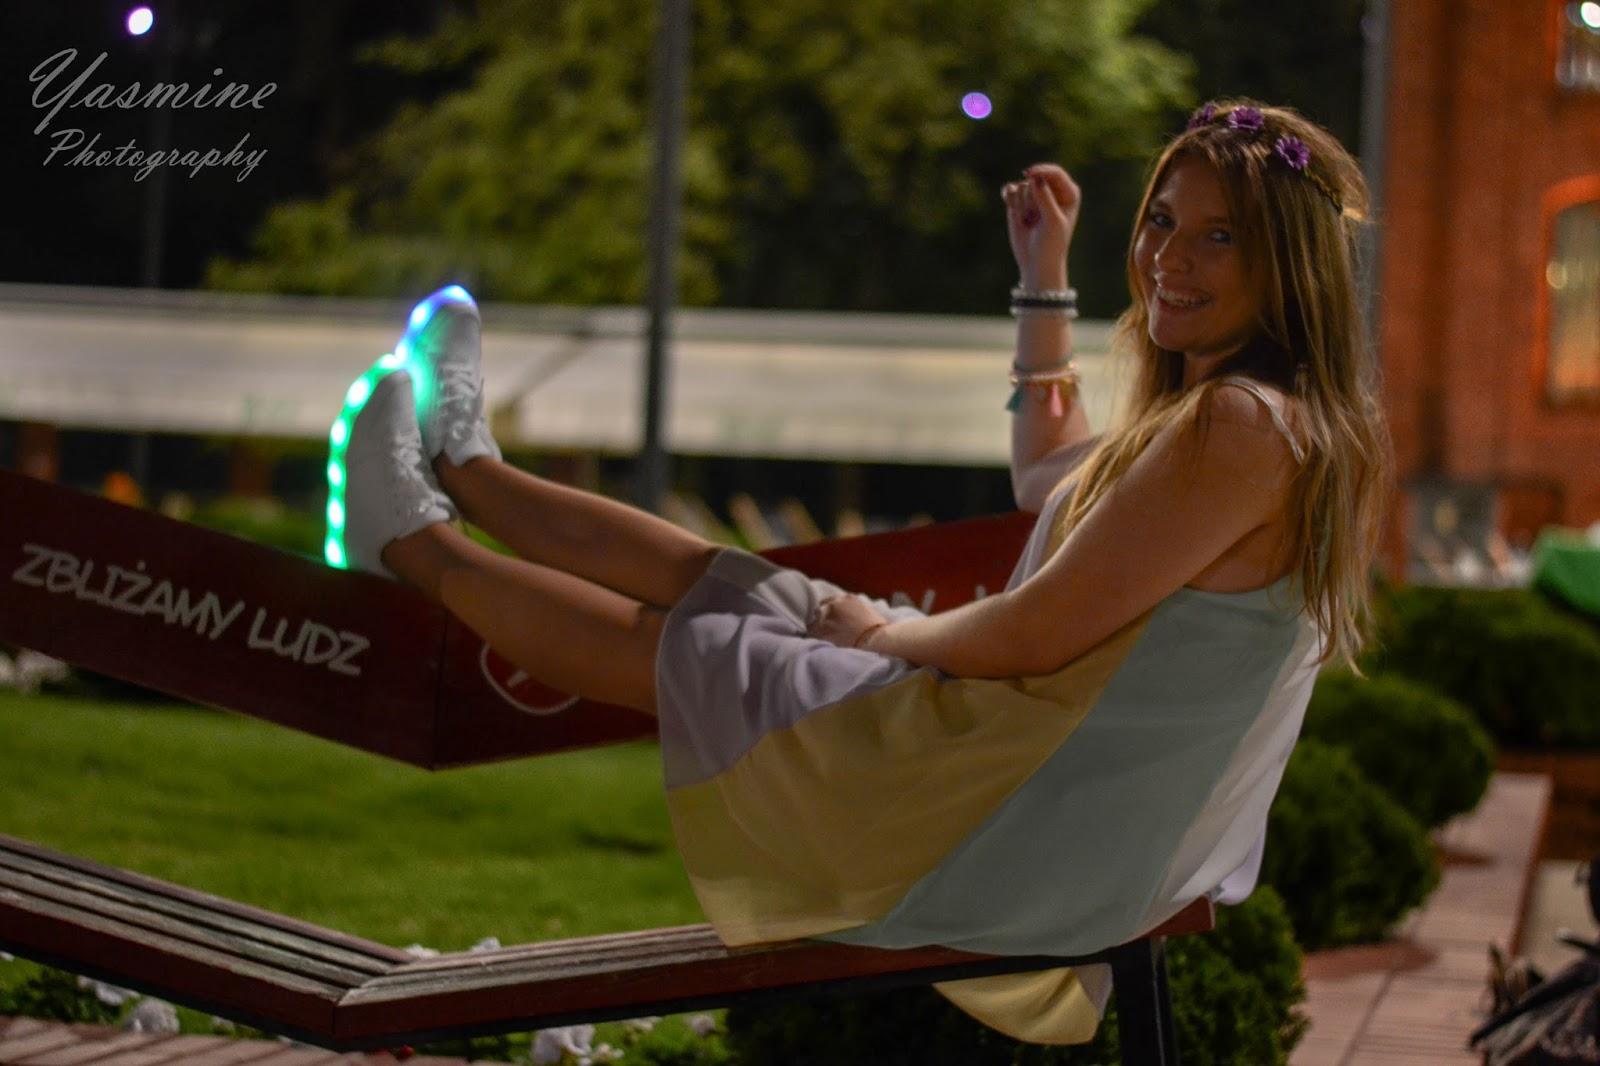 stylizacje festiwalowe ze smeakersami sneakersy disco light renee recenzja melodylaniella lookbook fashion night